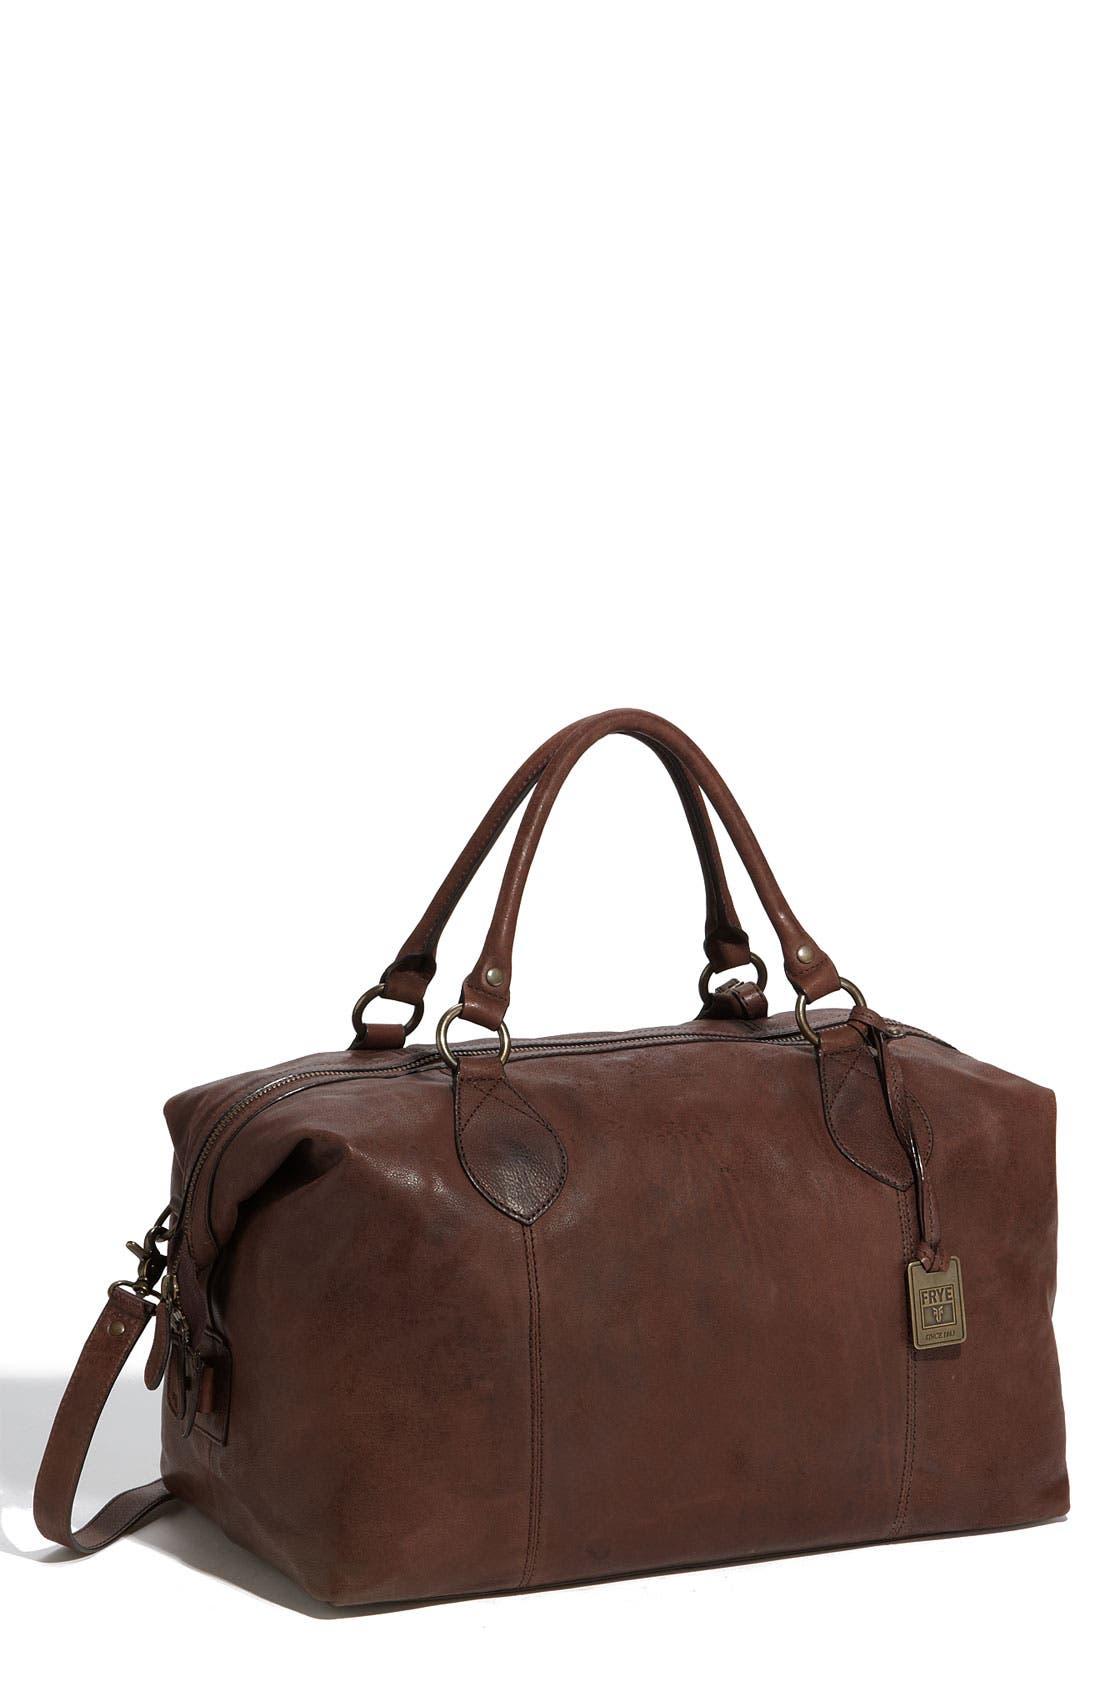 Main Image - Frye 'Logan' Leather Overnight Bag